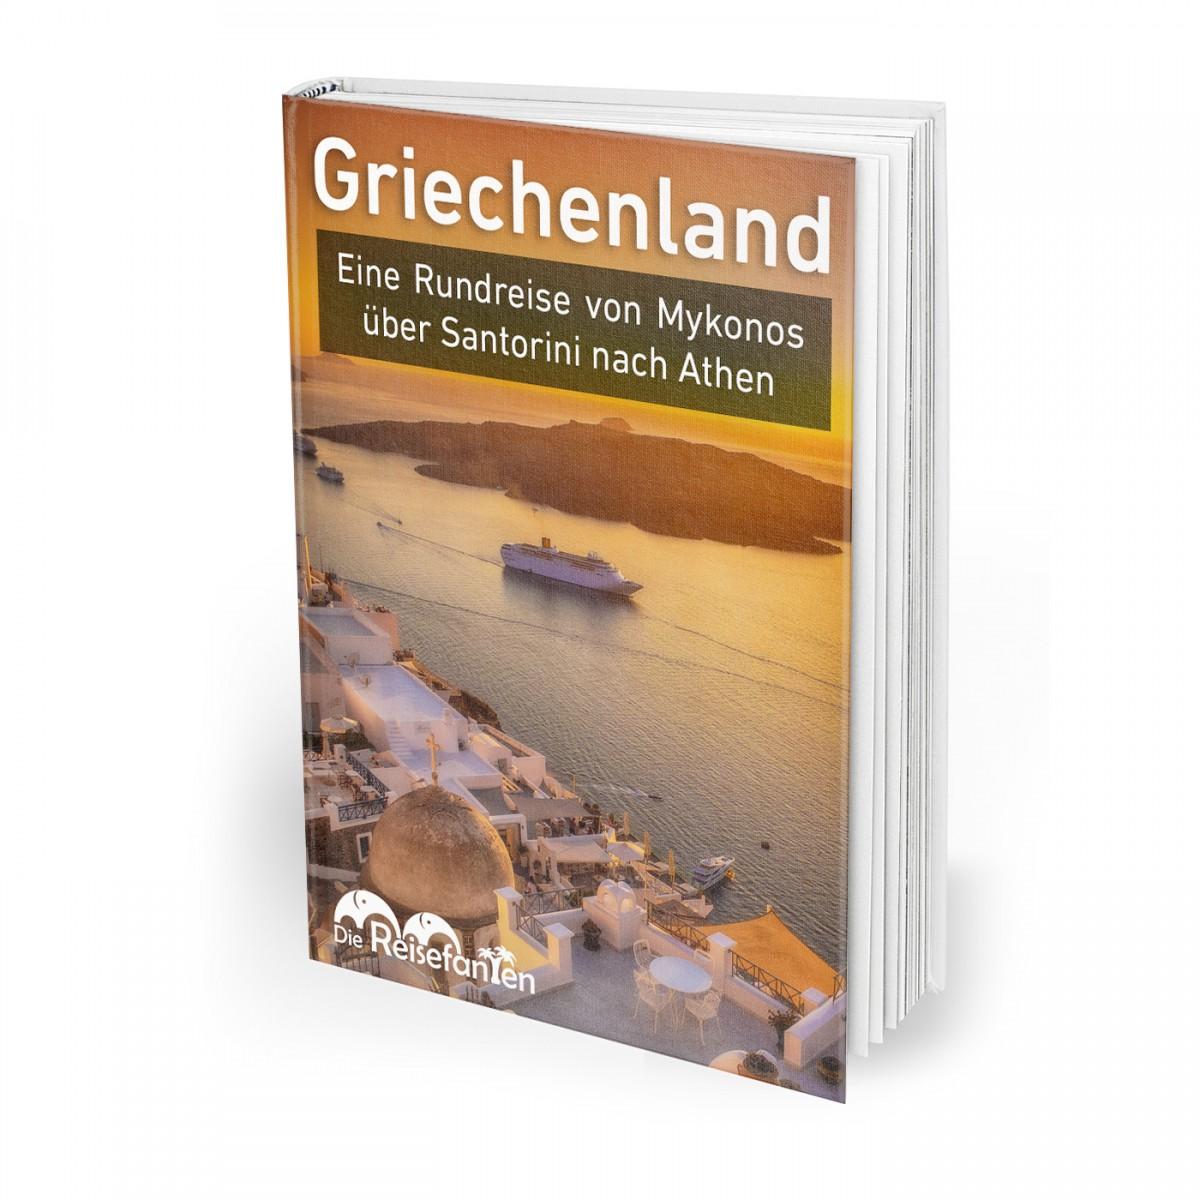 Reisefanten_eBook_Band6_Griechenland_Cover_v6_Mockup_1400px